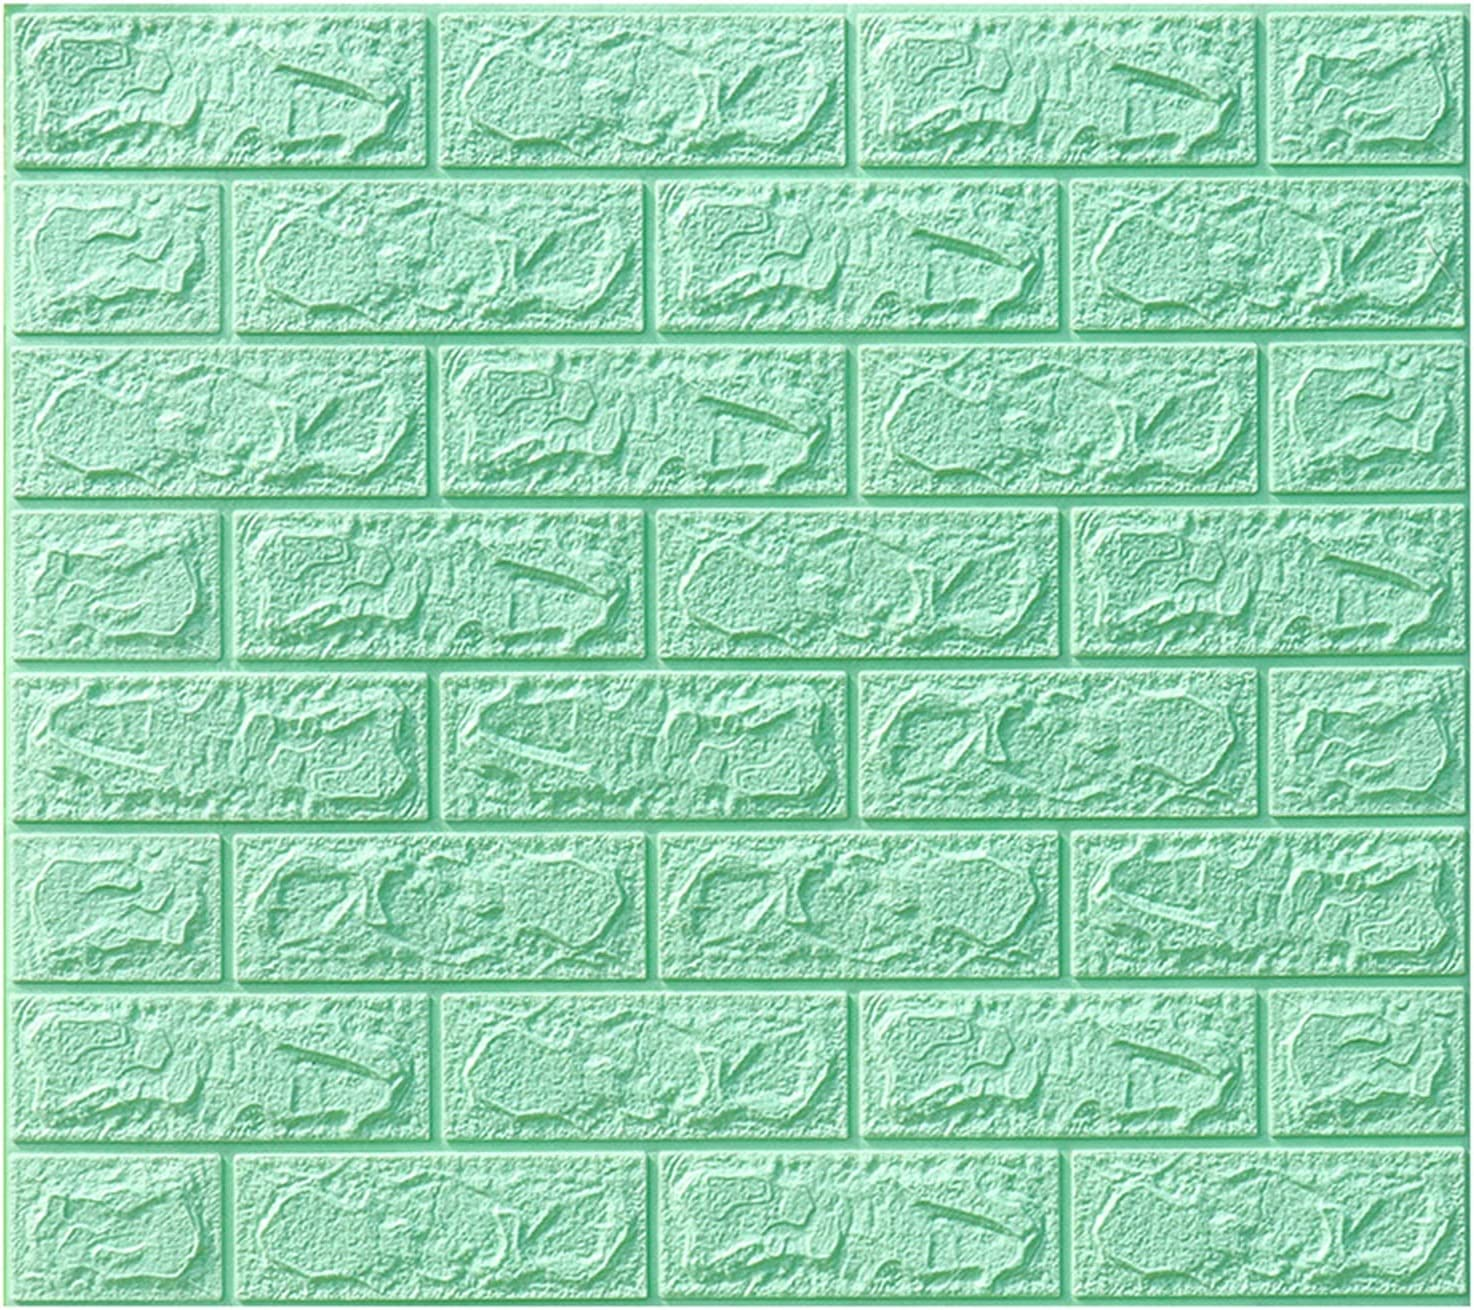 FISISZ Foam Wall Sticker 3D Sacramento Mall and Peel Stick Panels Wallpaper Max 45% OFF